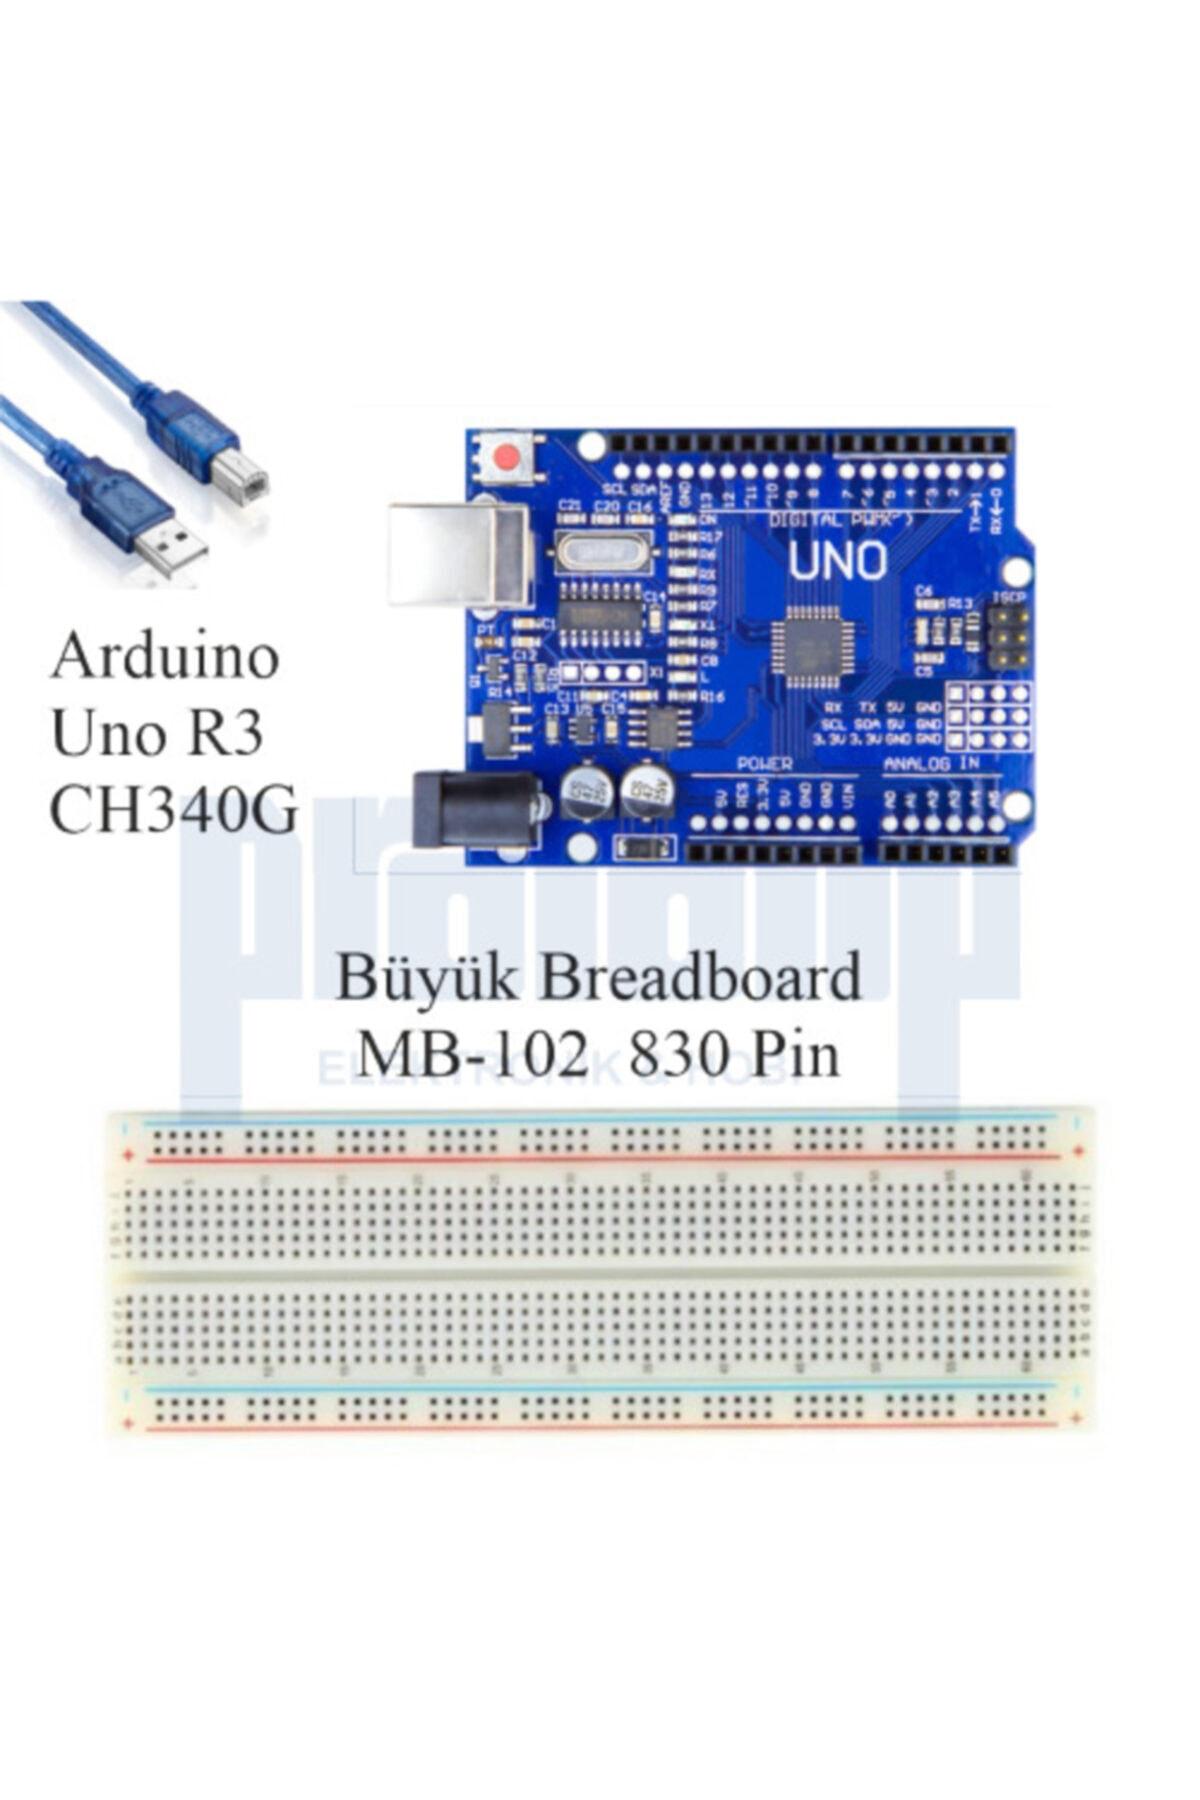 Arduino Uno R3 ( Ch340g ) Ekonomik Set 67 Parça 235 Adet 2